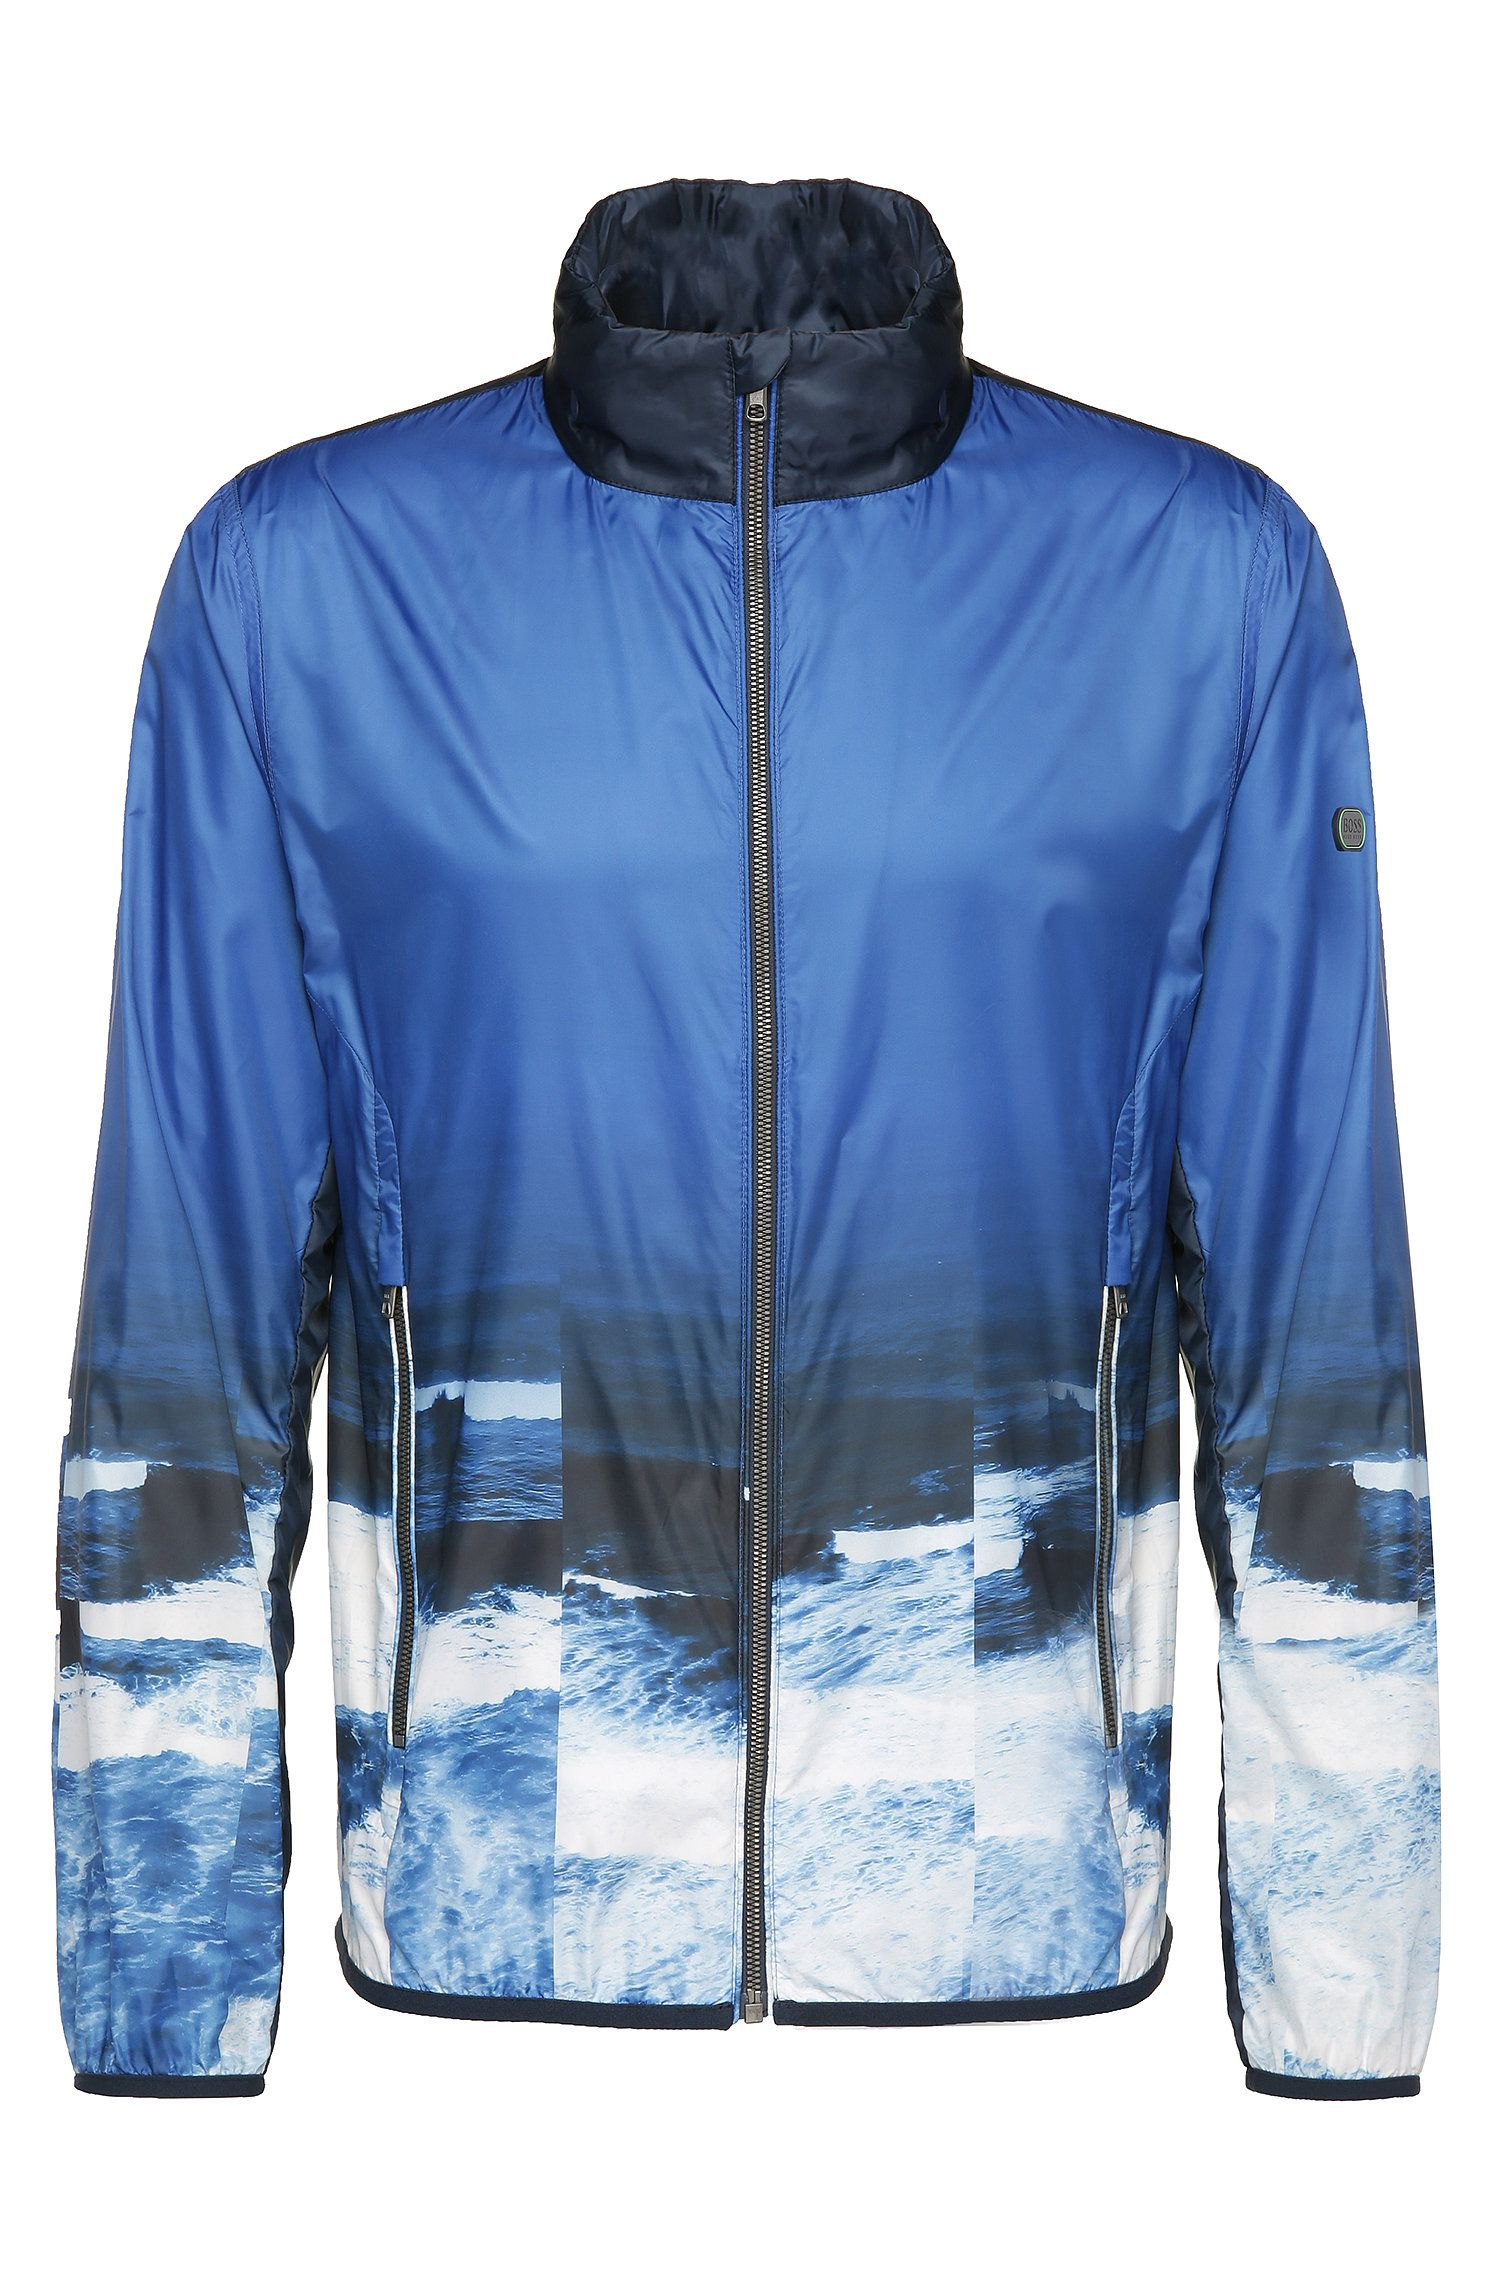 Outdoor-Jacke aus Material-Mix mit Fotoprint: ´Jocean`